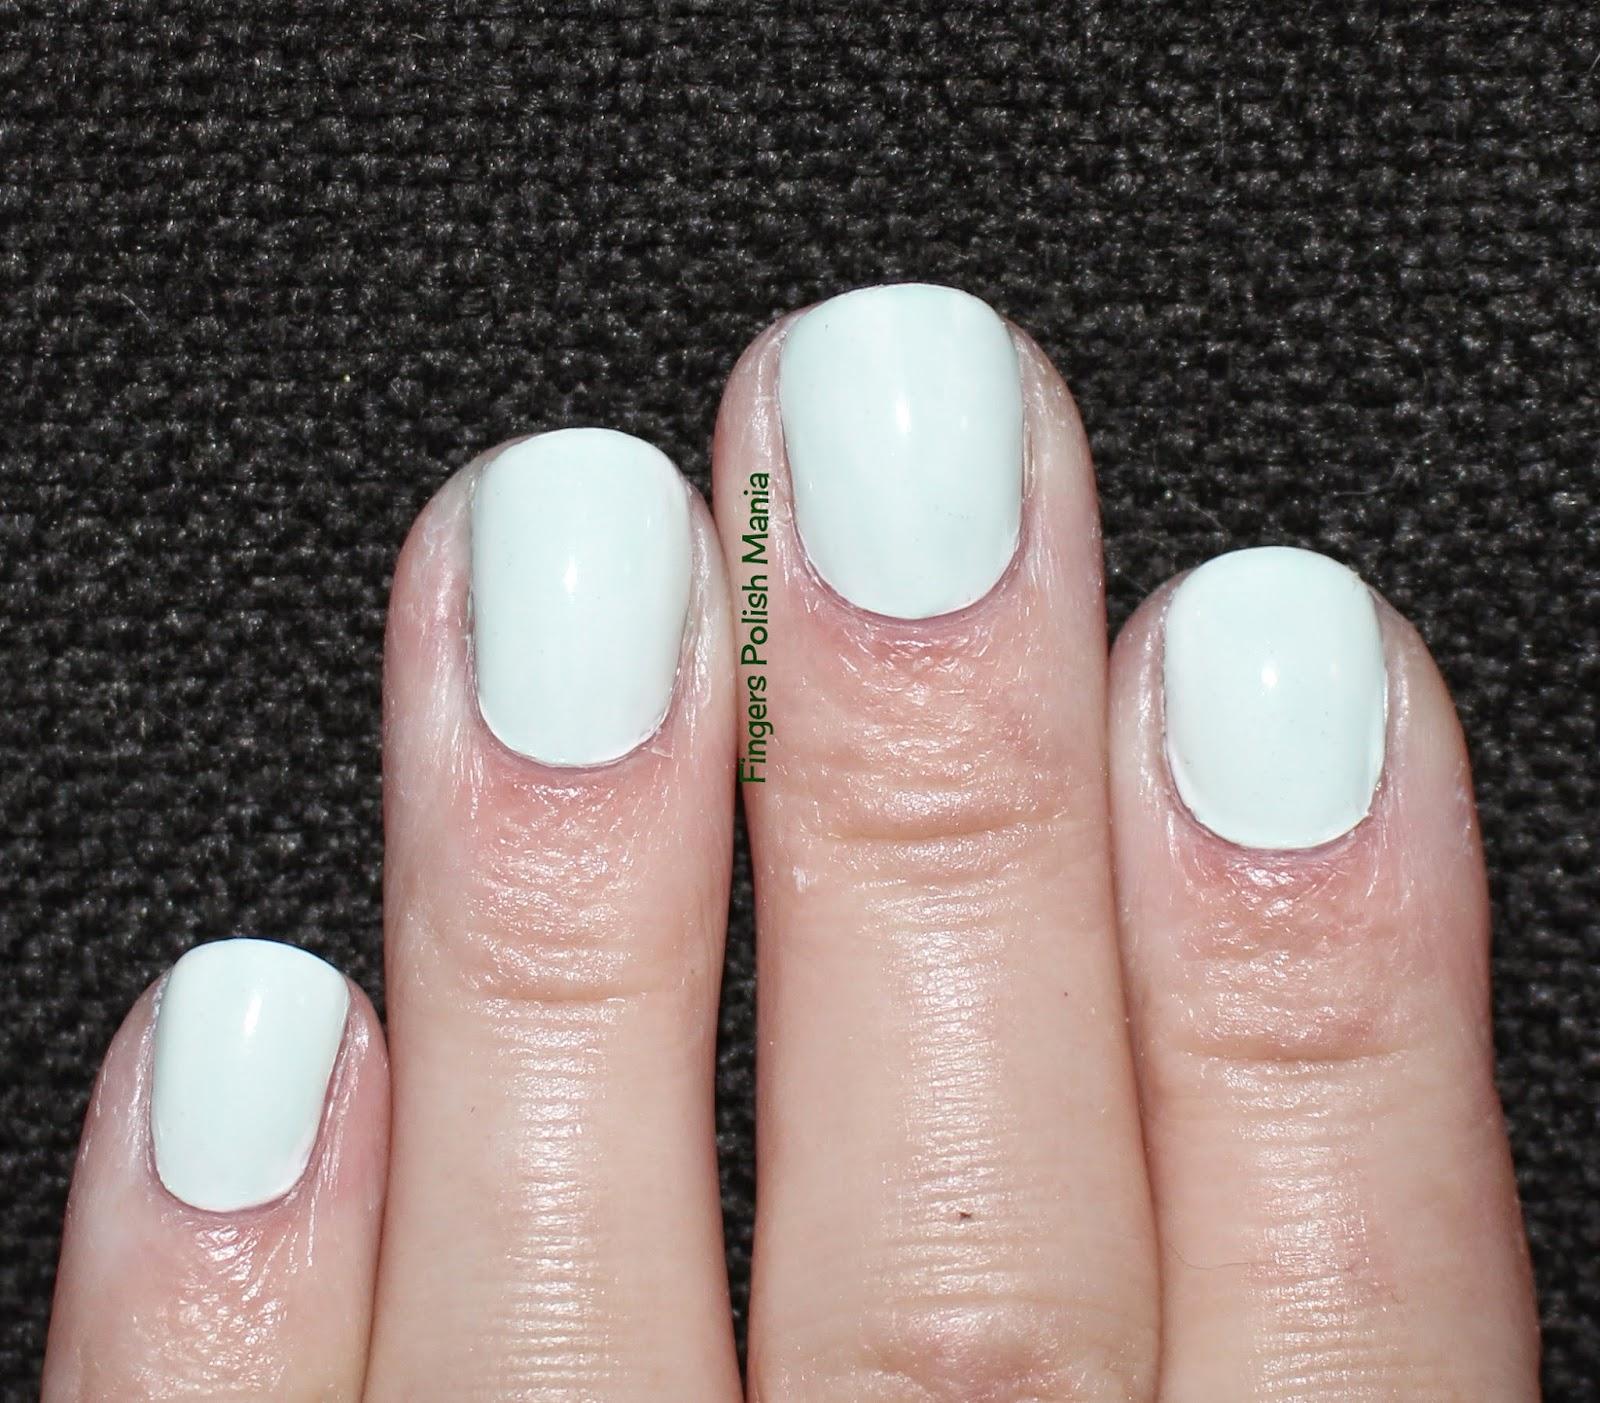 fingers polish mania: August 2014